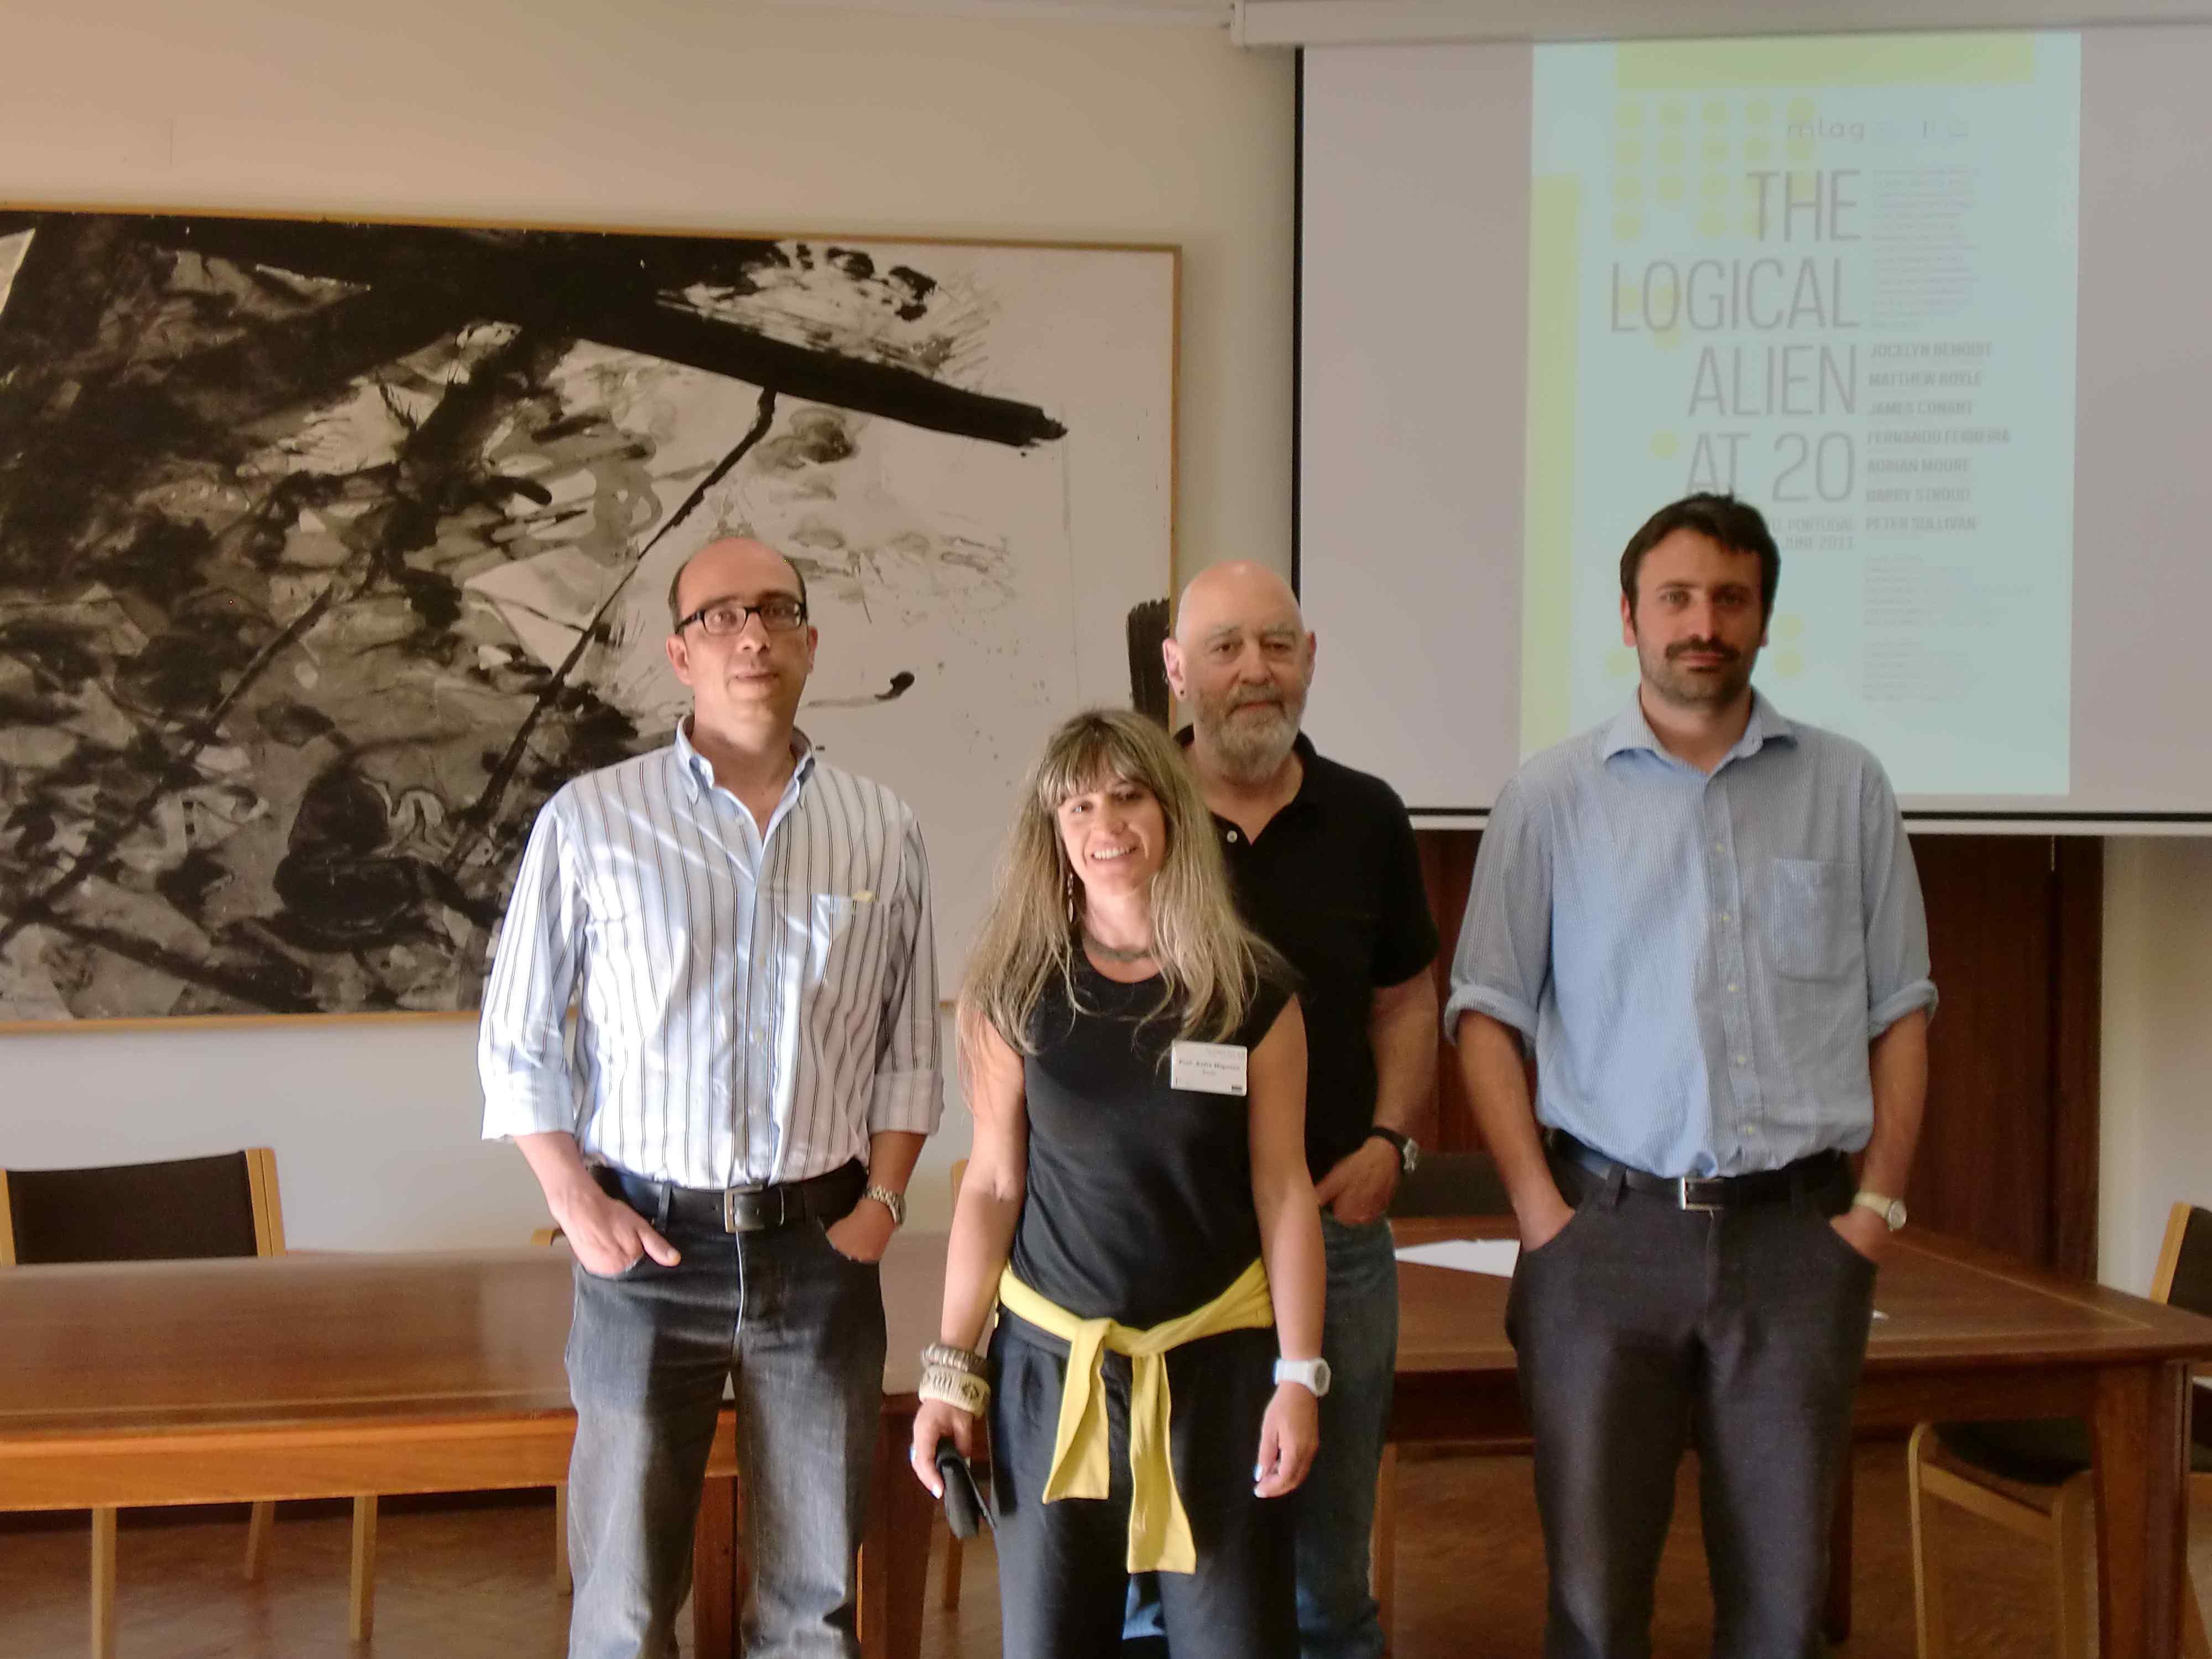 João Alberto Pinto, Sofia Miguens, Charles Travis, Mattia Riccardi